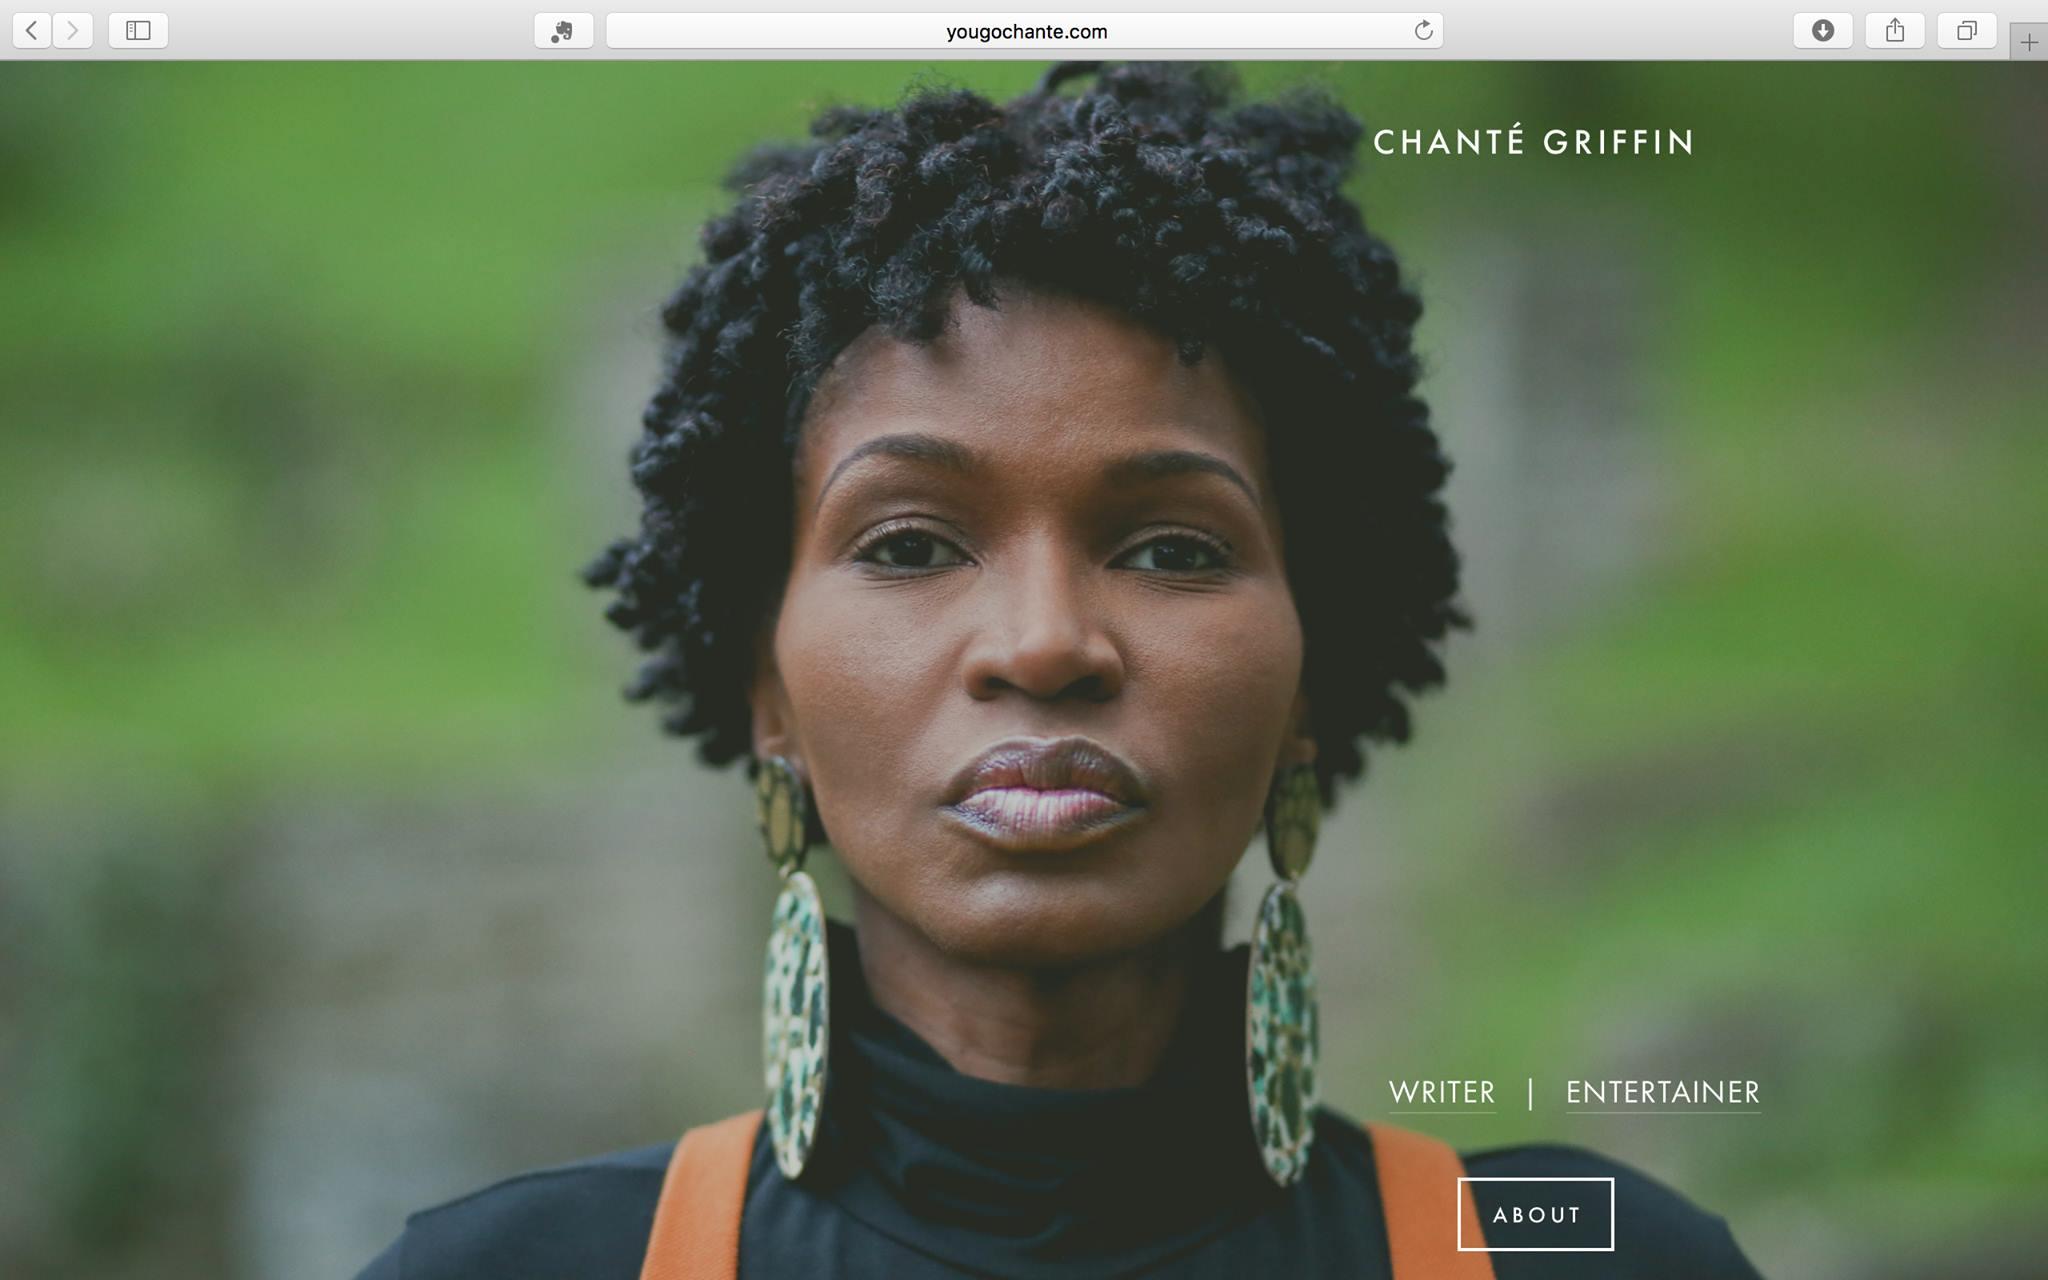 My website: yougochante.com